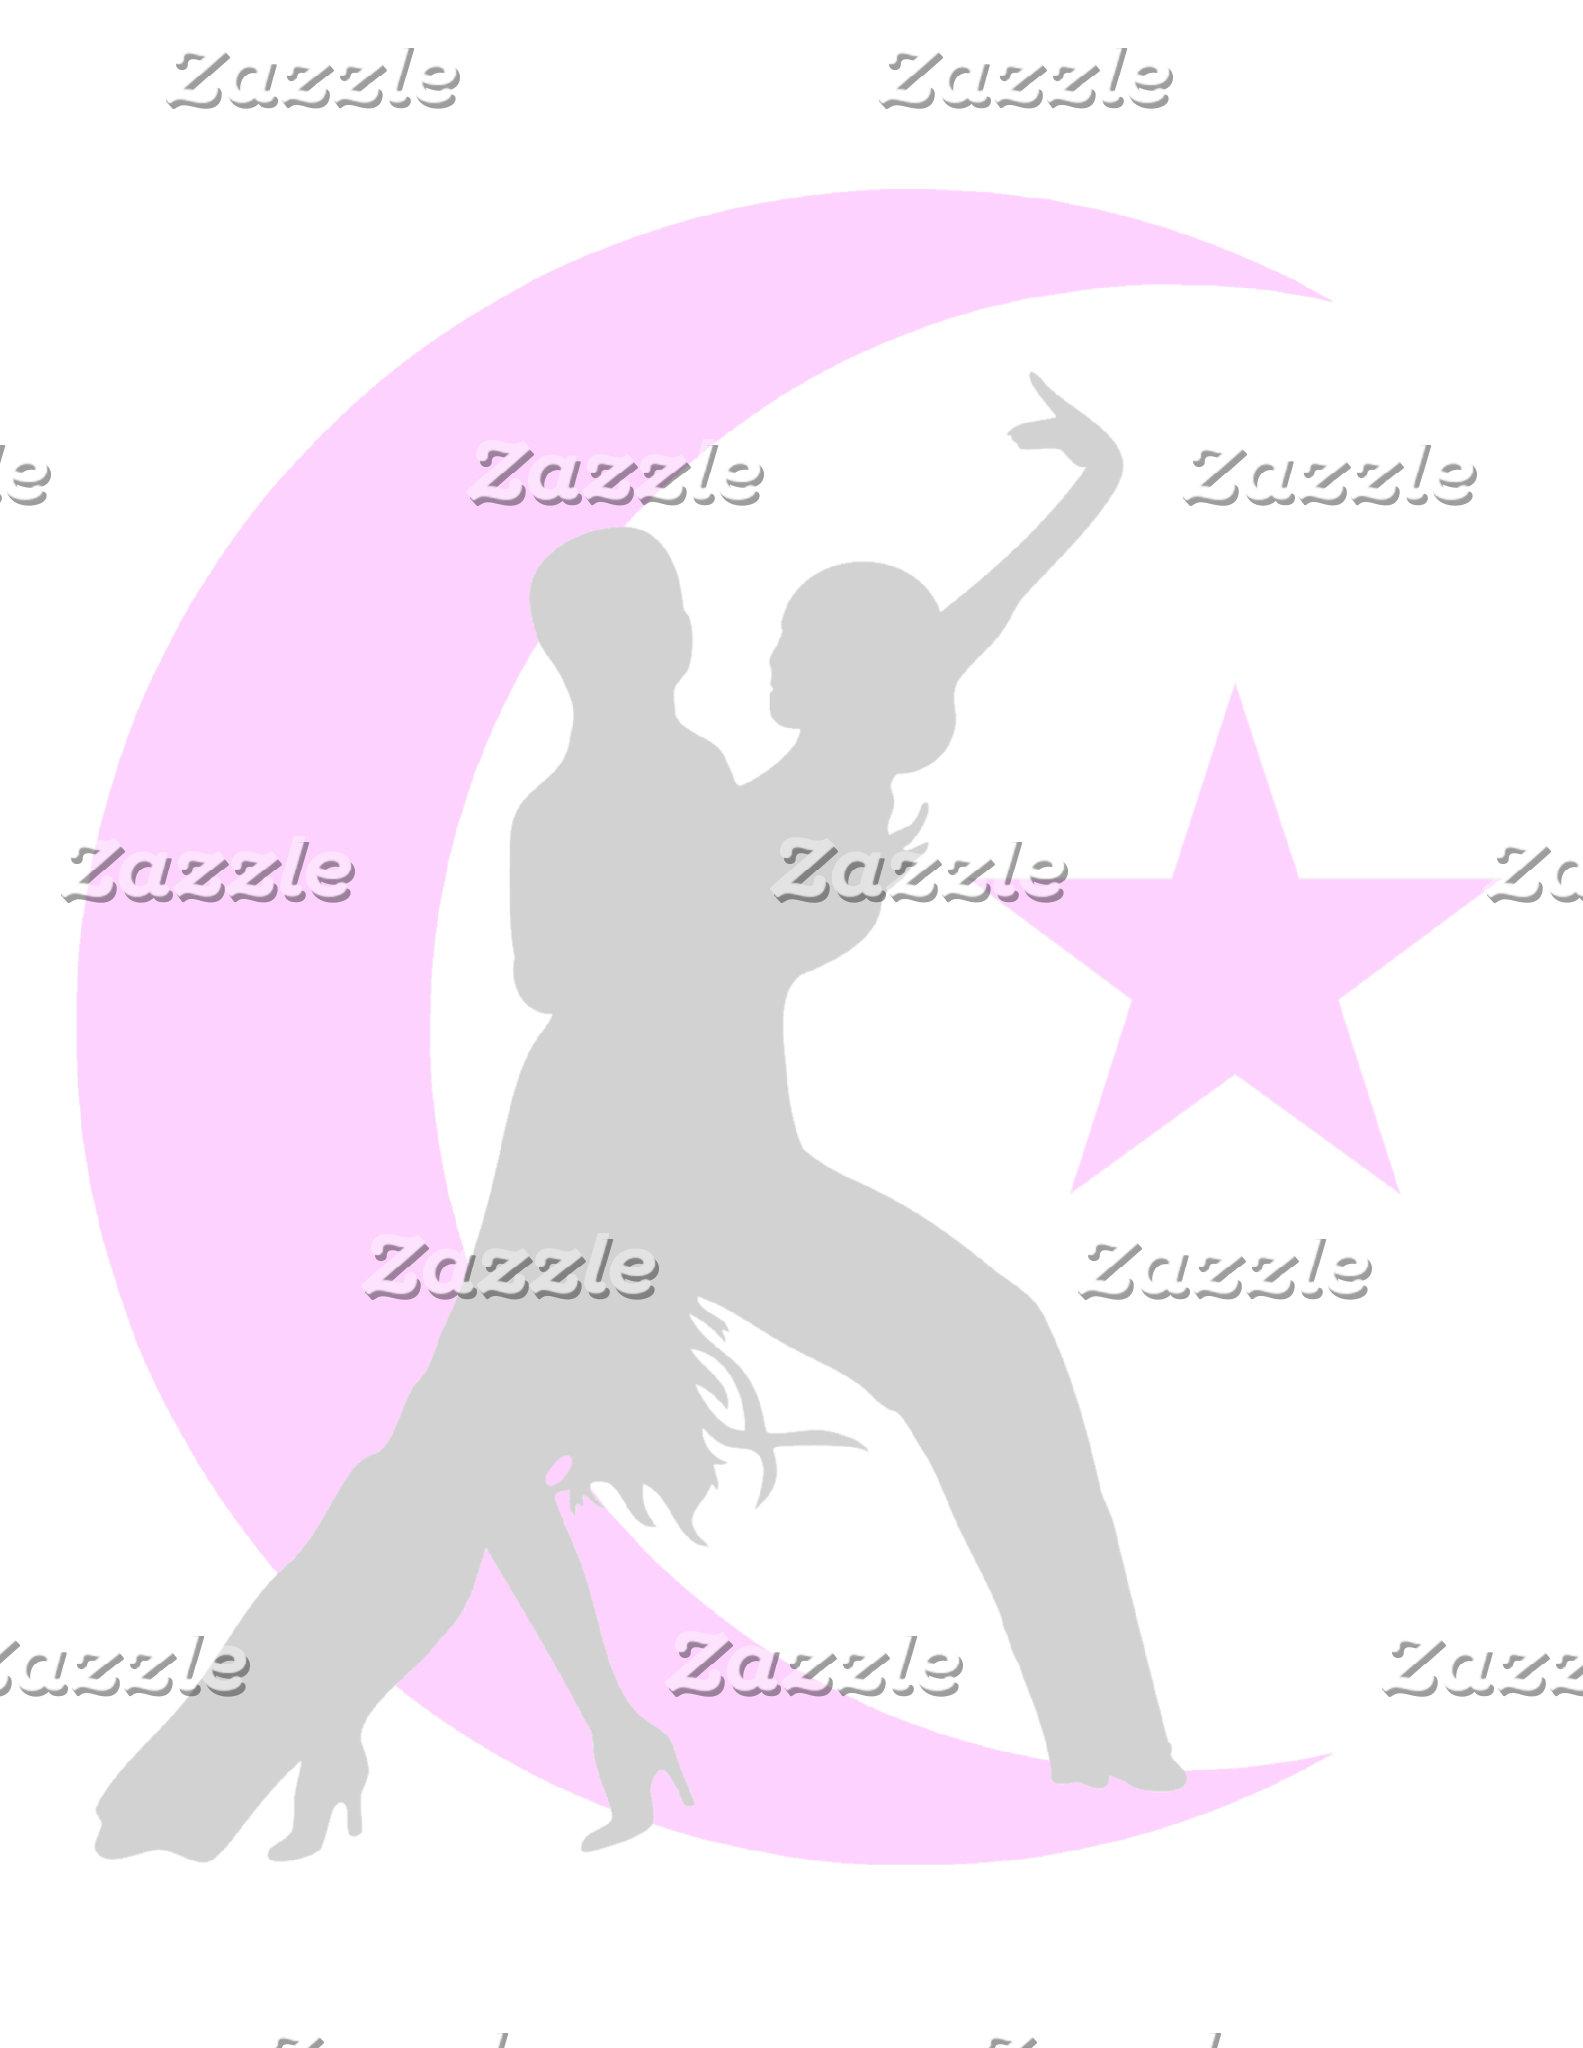 Ballroom Dance Invitations & Stationary